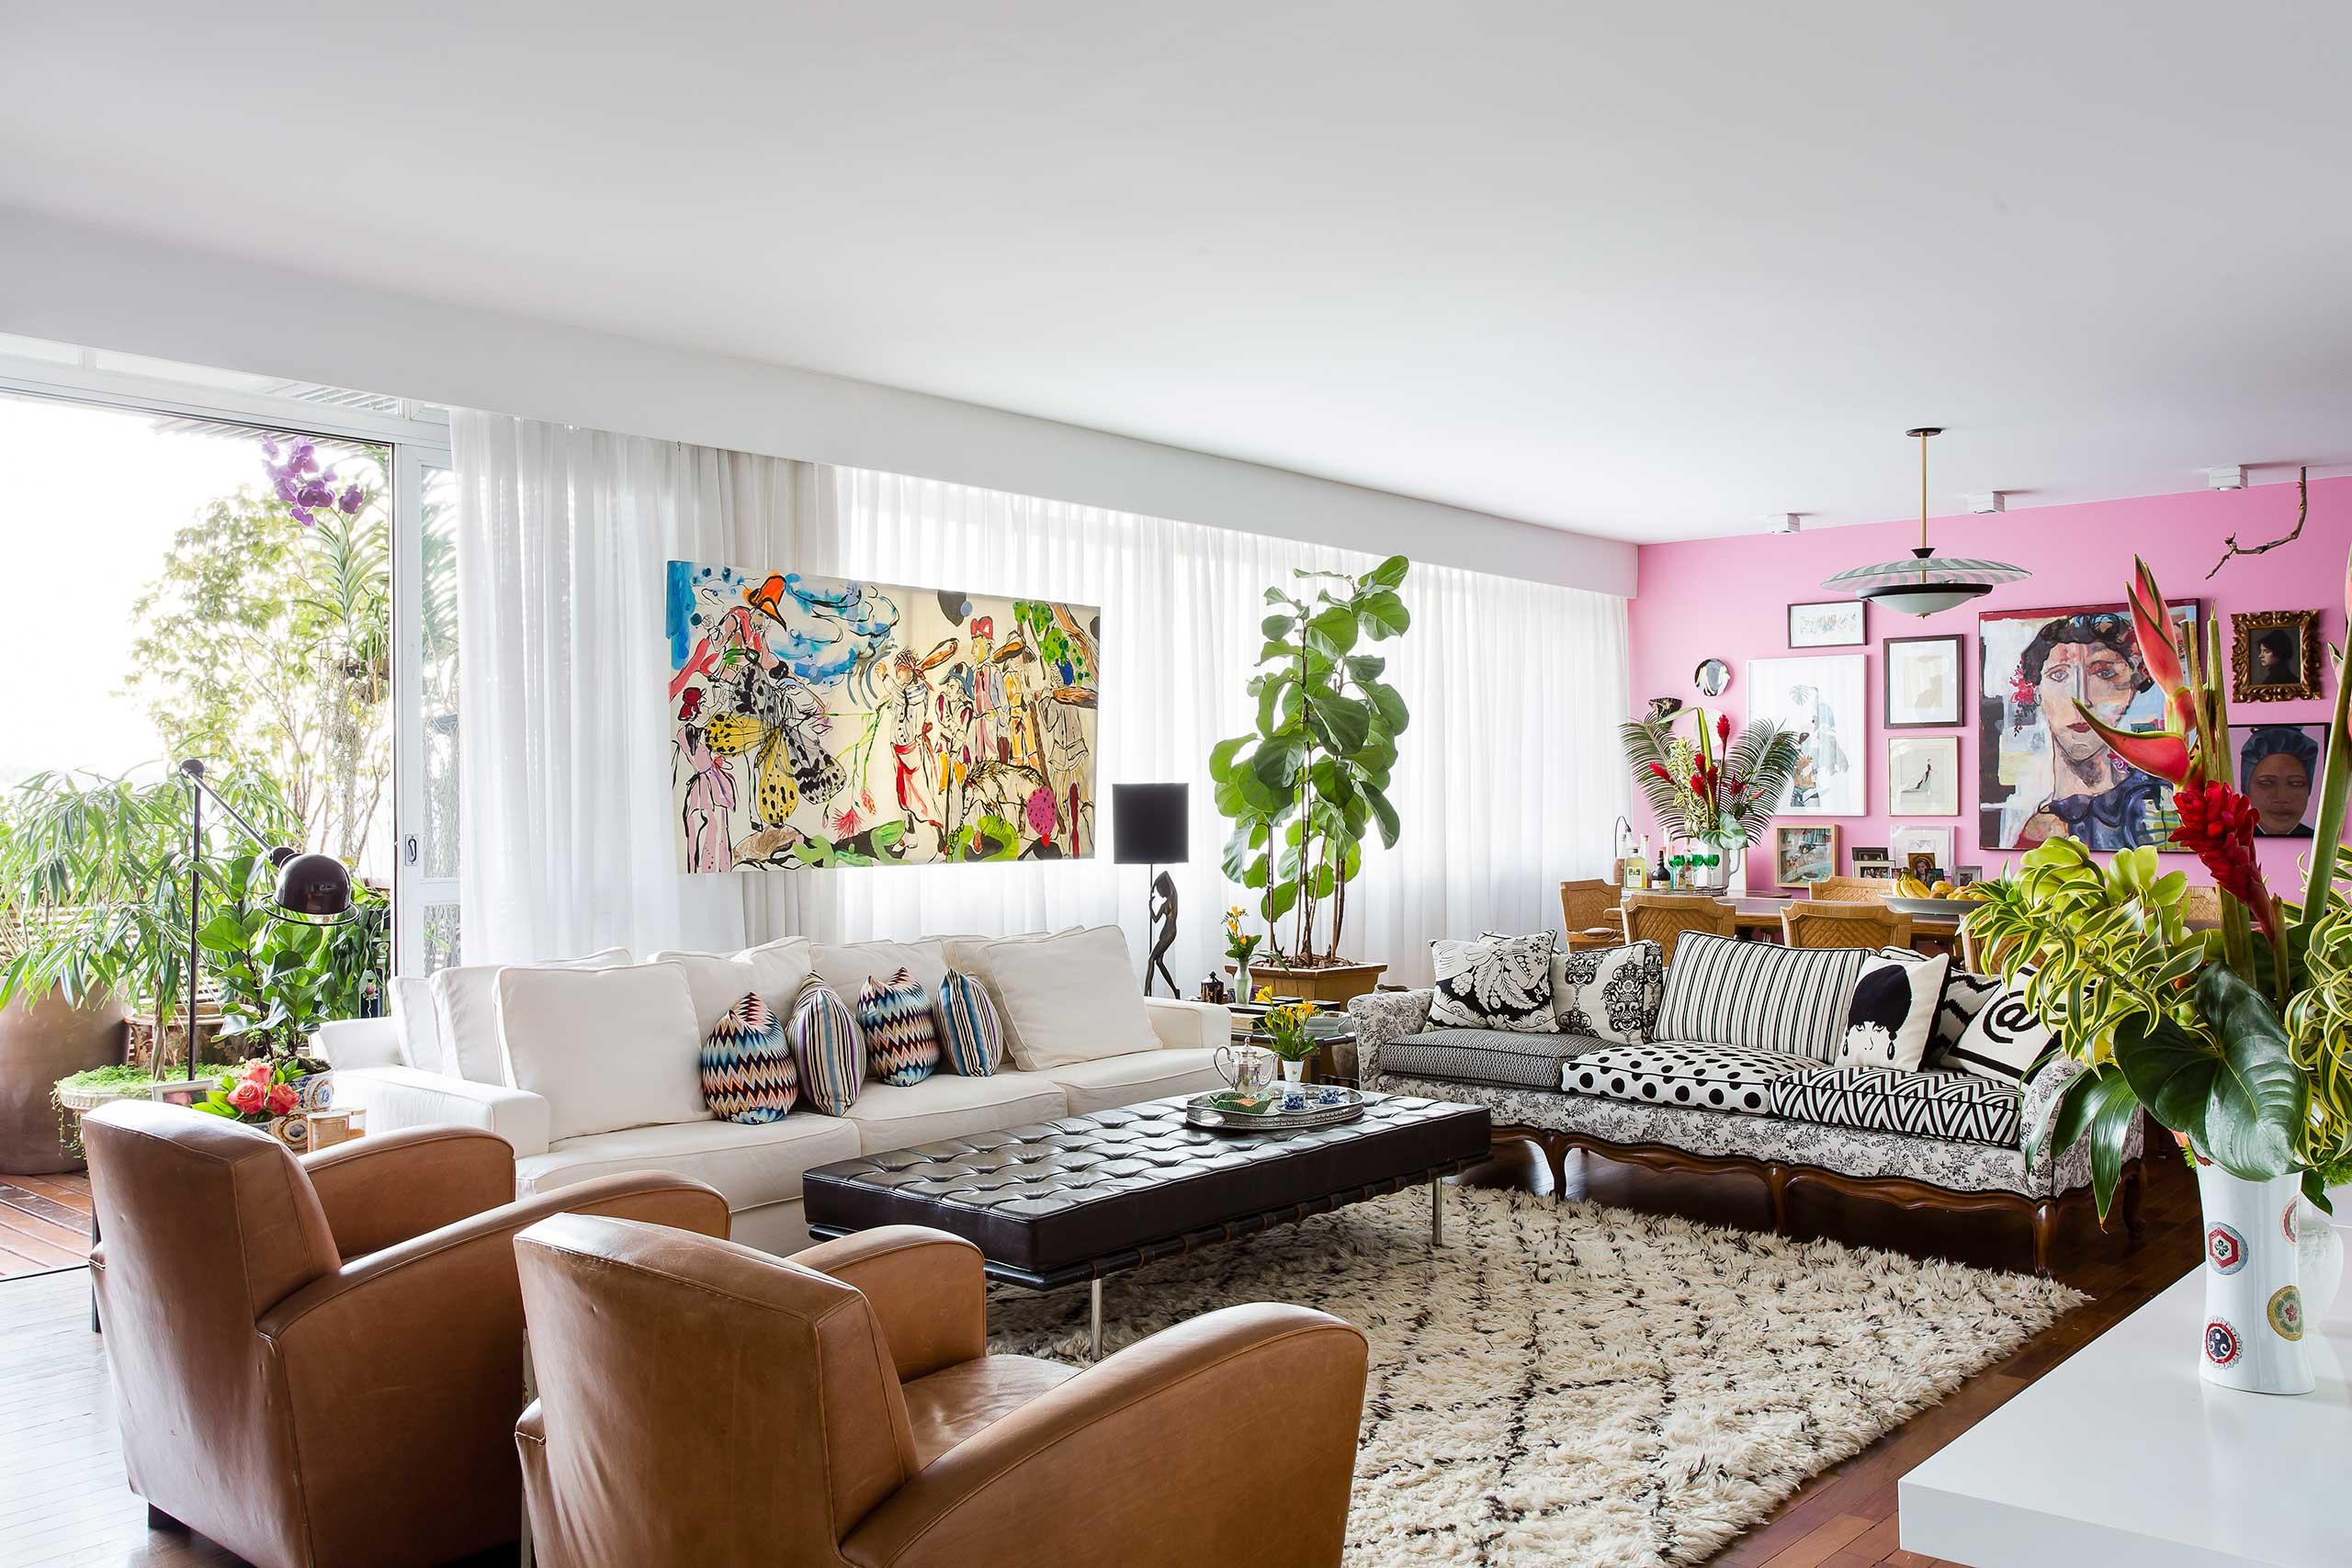 p3_ana_strumpf_apartment_ibiapinopolis_sao_paulo_brazil_yatzer